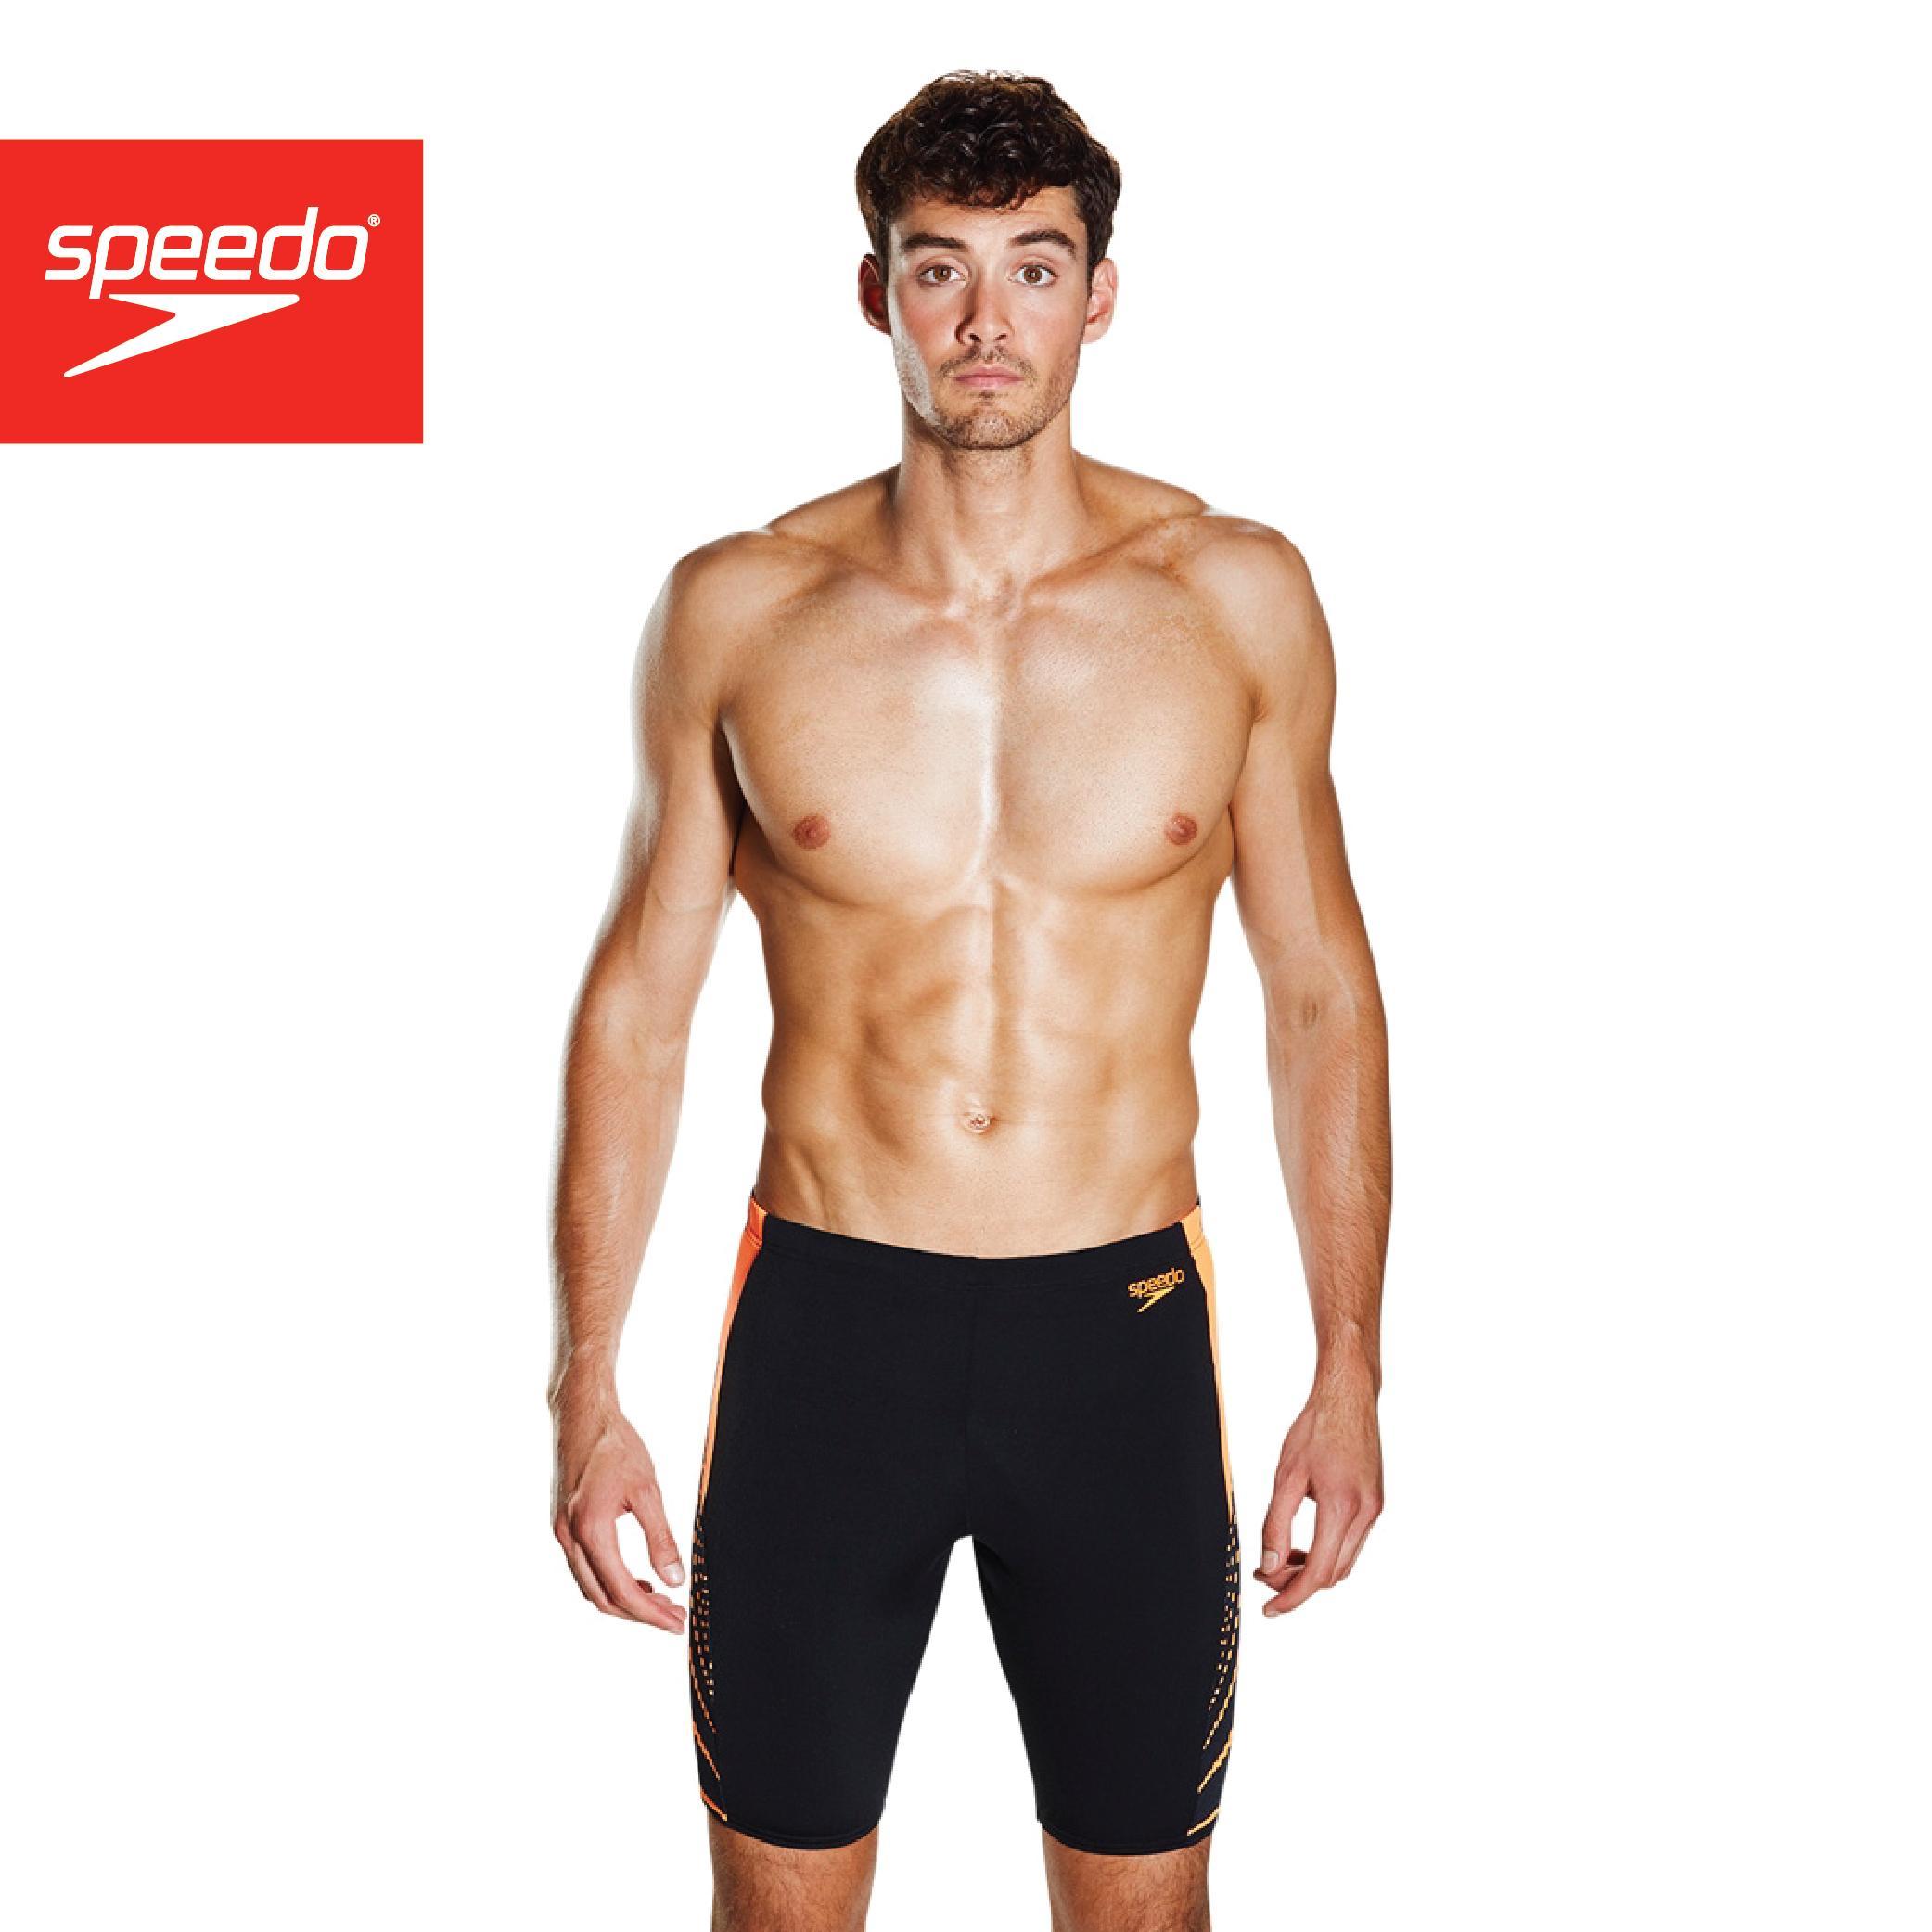 Speedo Mens Graphic Splice Aquashort Swimming Swim Shorts